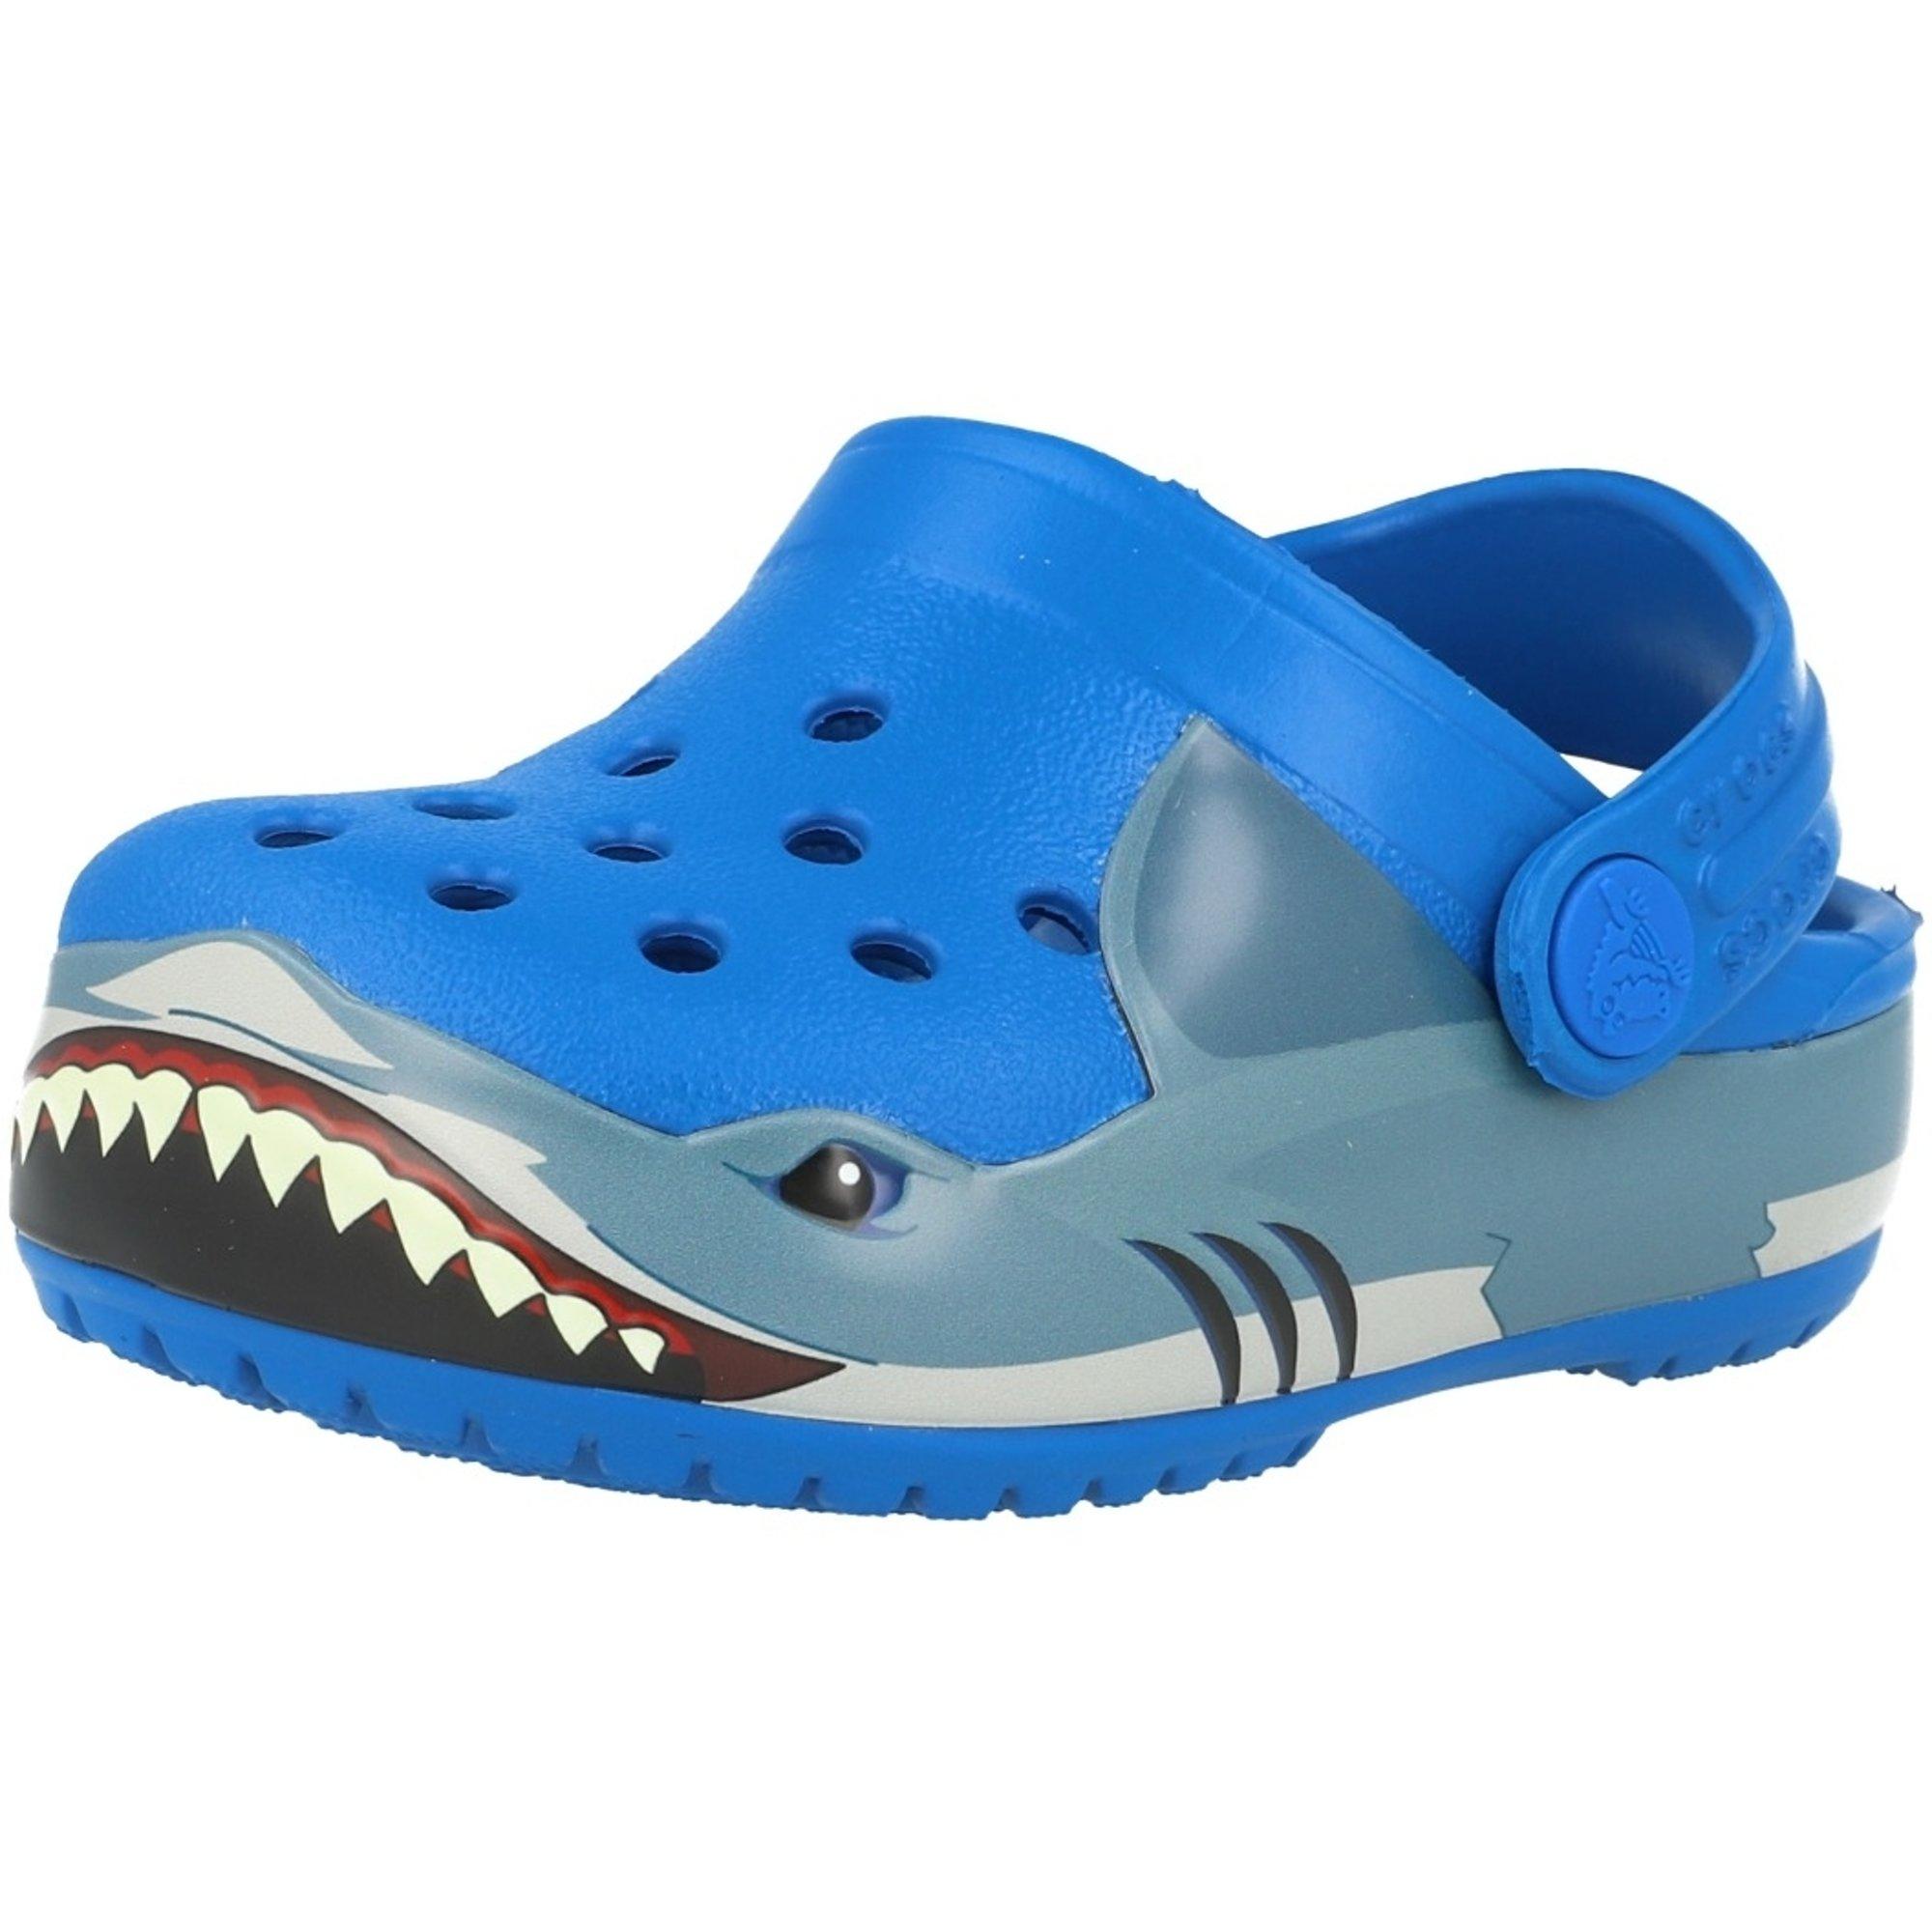 Crocs Kids Fun Lab Shark Band Clogs